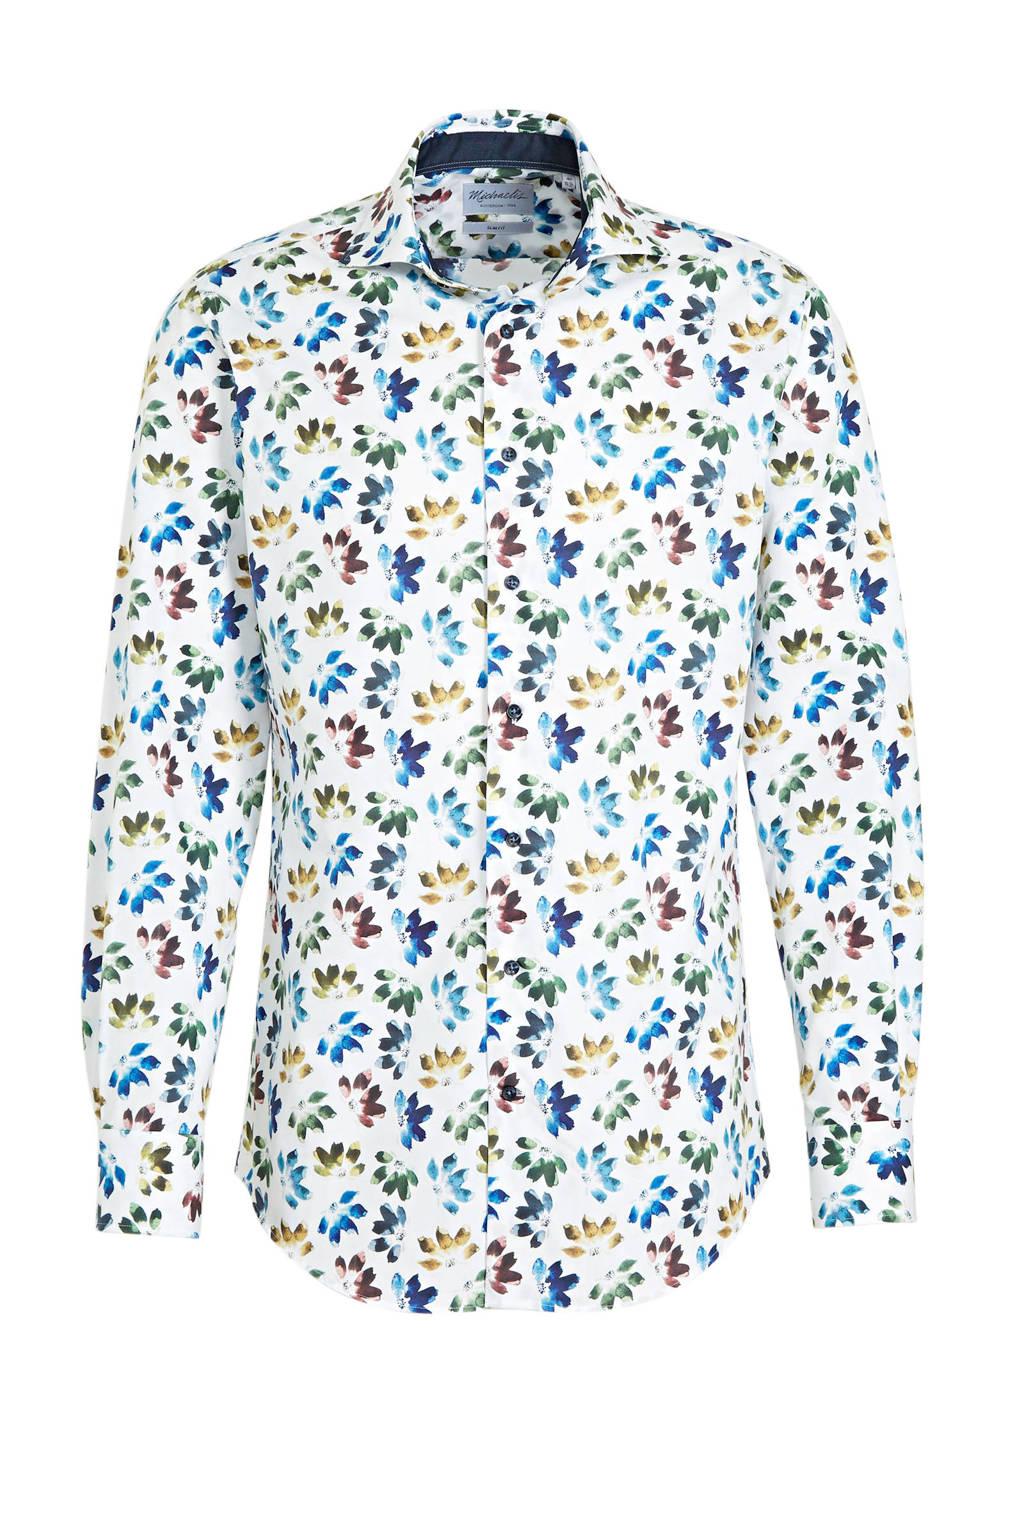 Michaelis gebloemd slim fit overhemd blauw/wit/kaki, Blauw/wit/kaki